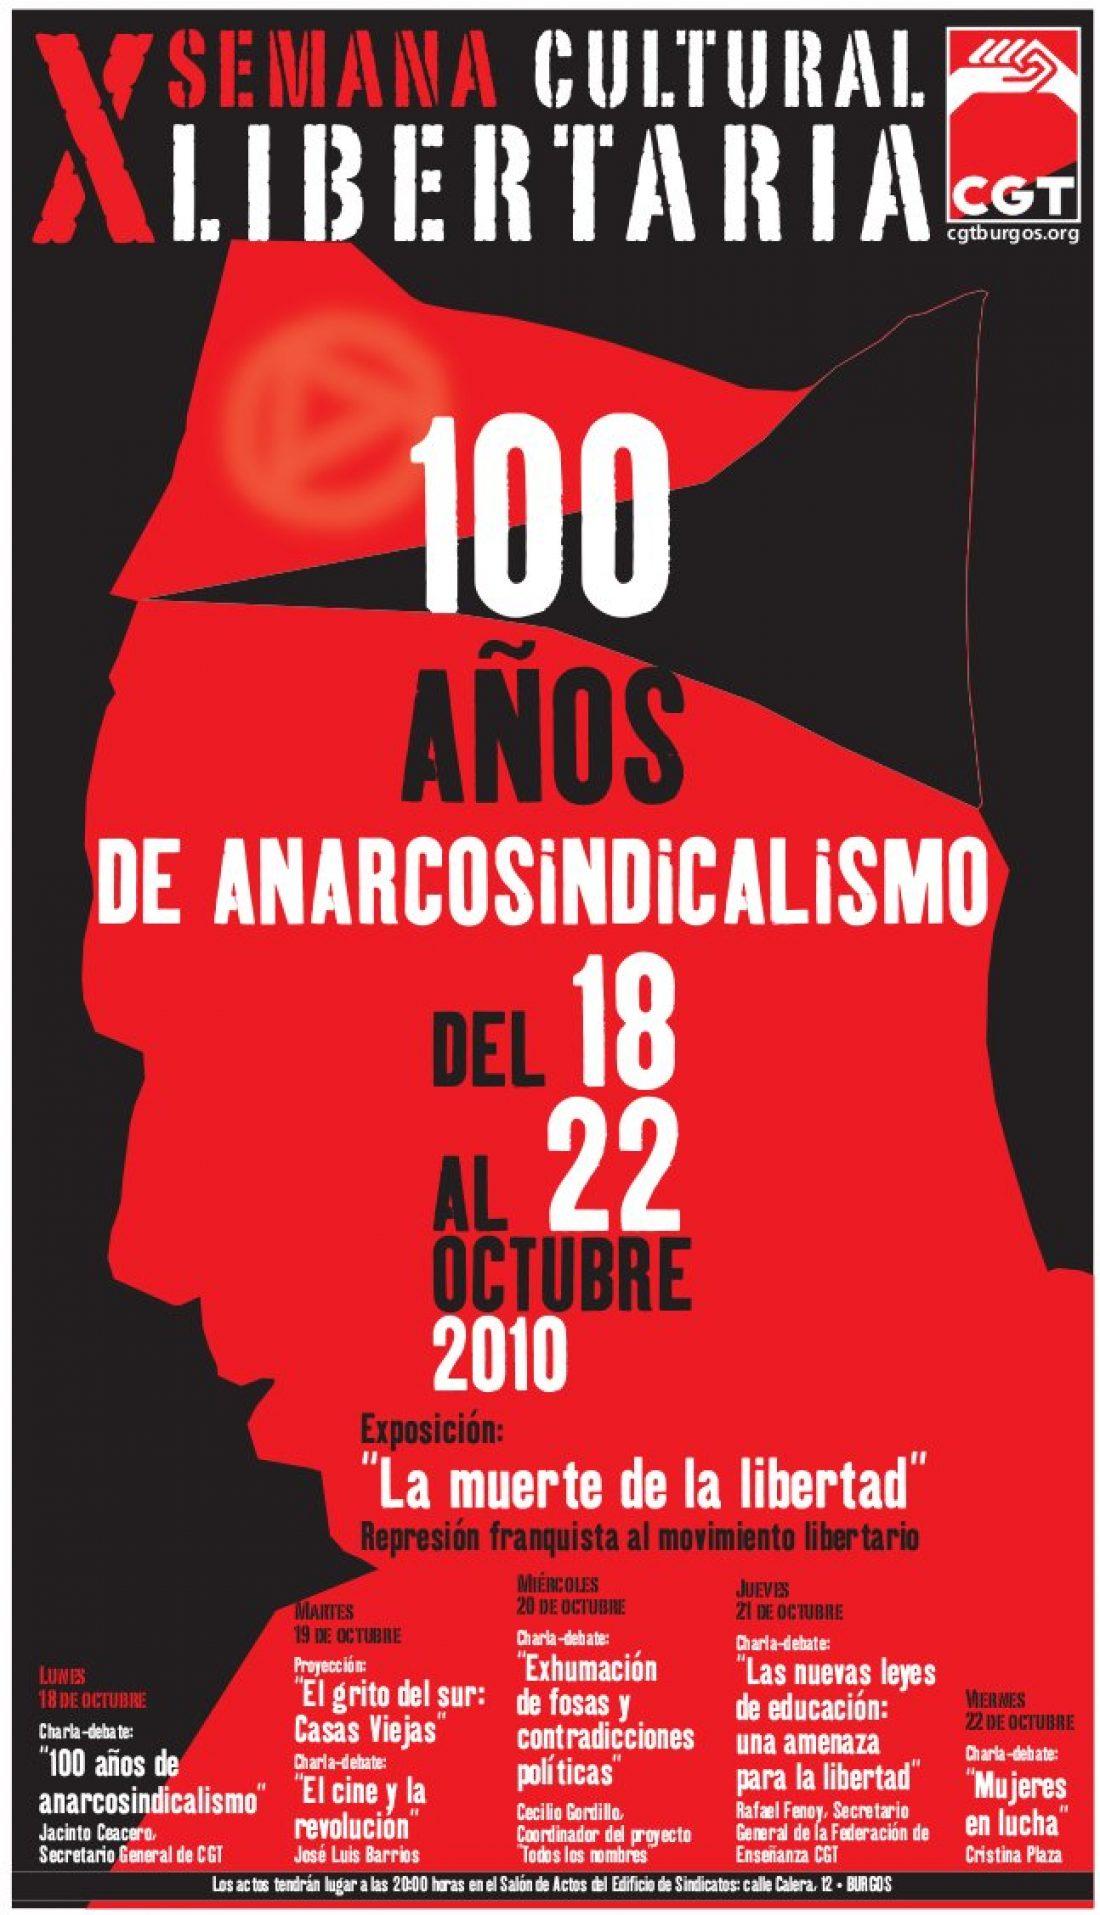 Burgos, del 18 al 22 de octubre: X Semana Cultural Libertaria «100 AÑOS DE ANARCOSINDICALISMO»